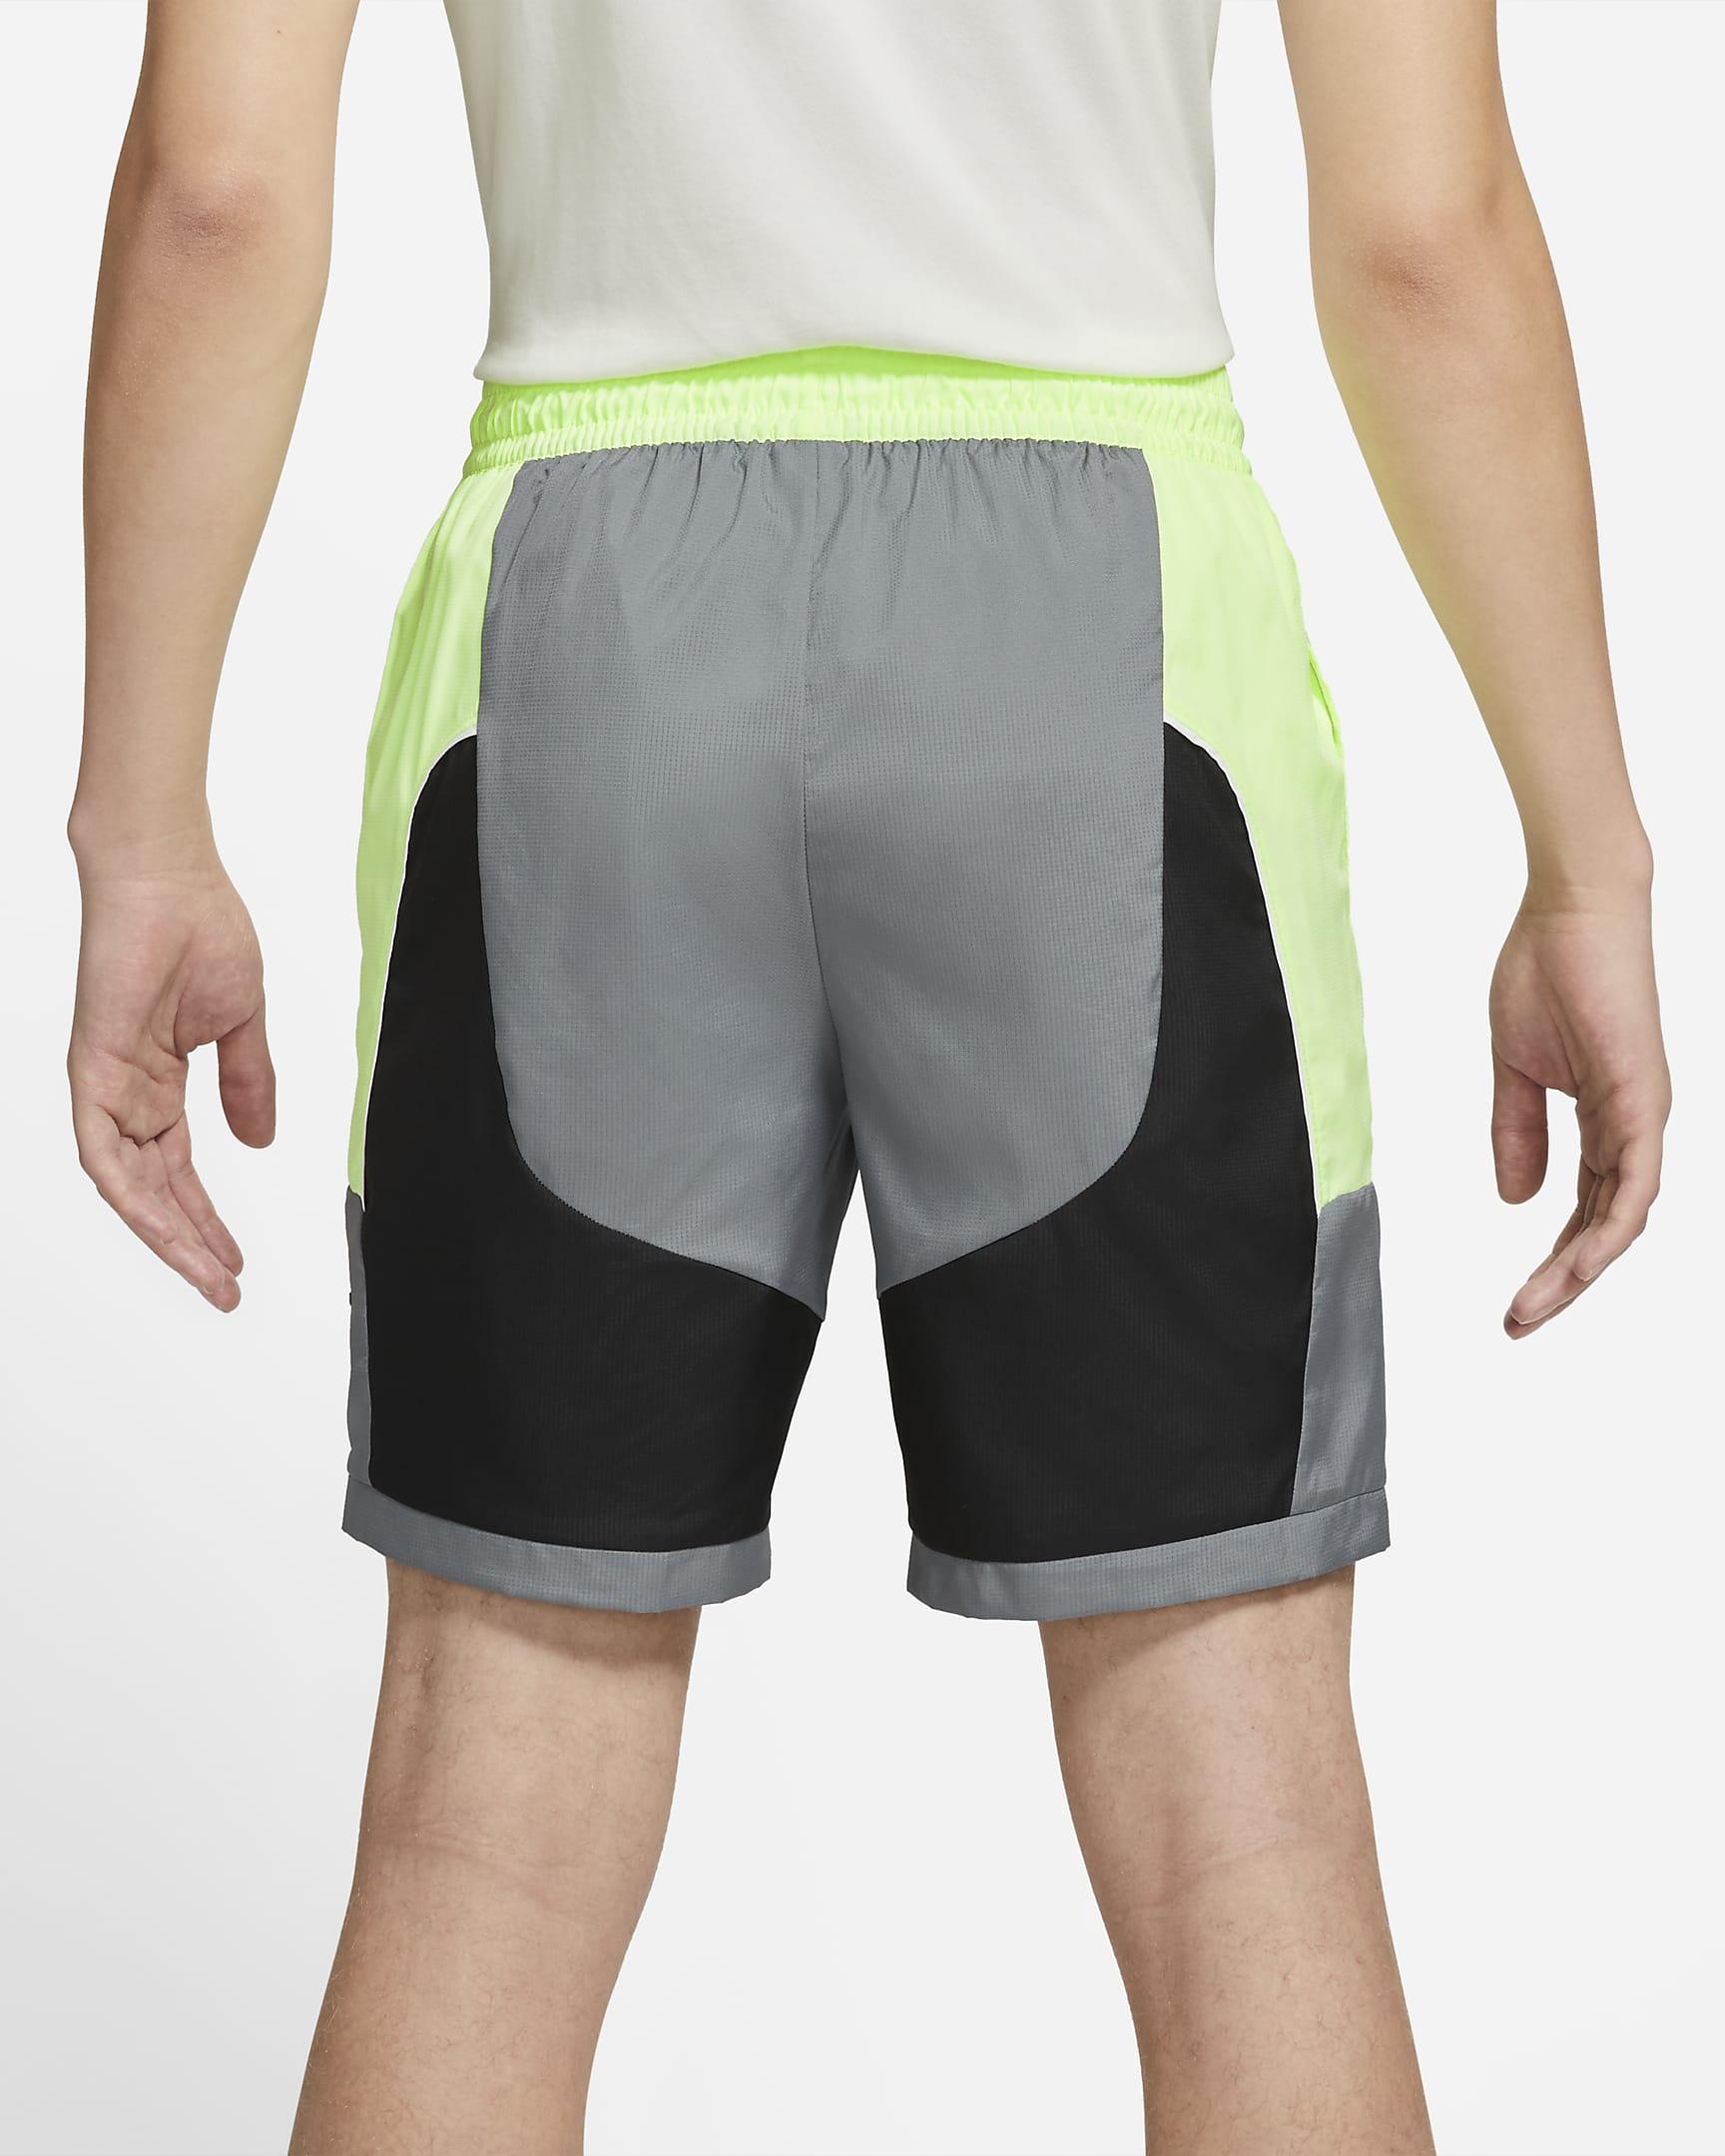 throwback-mens-basketball-shorts-D2s5Rs-2